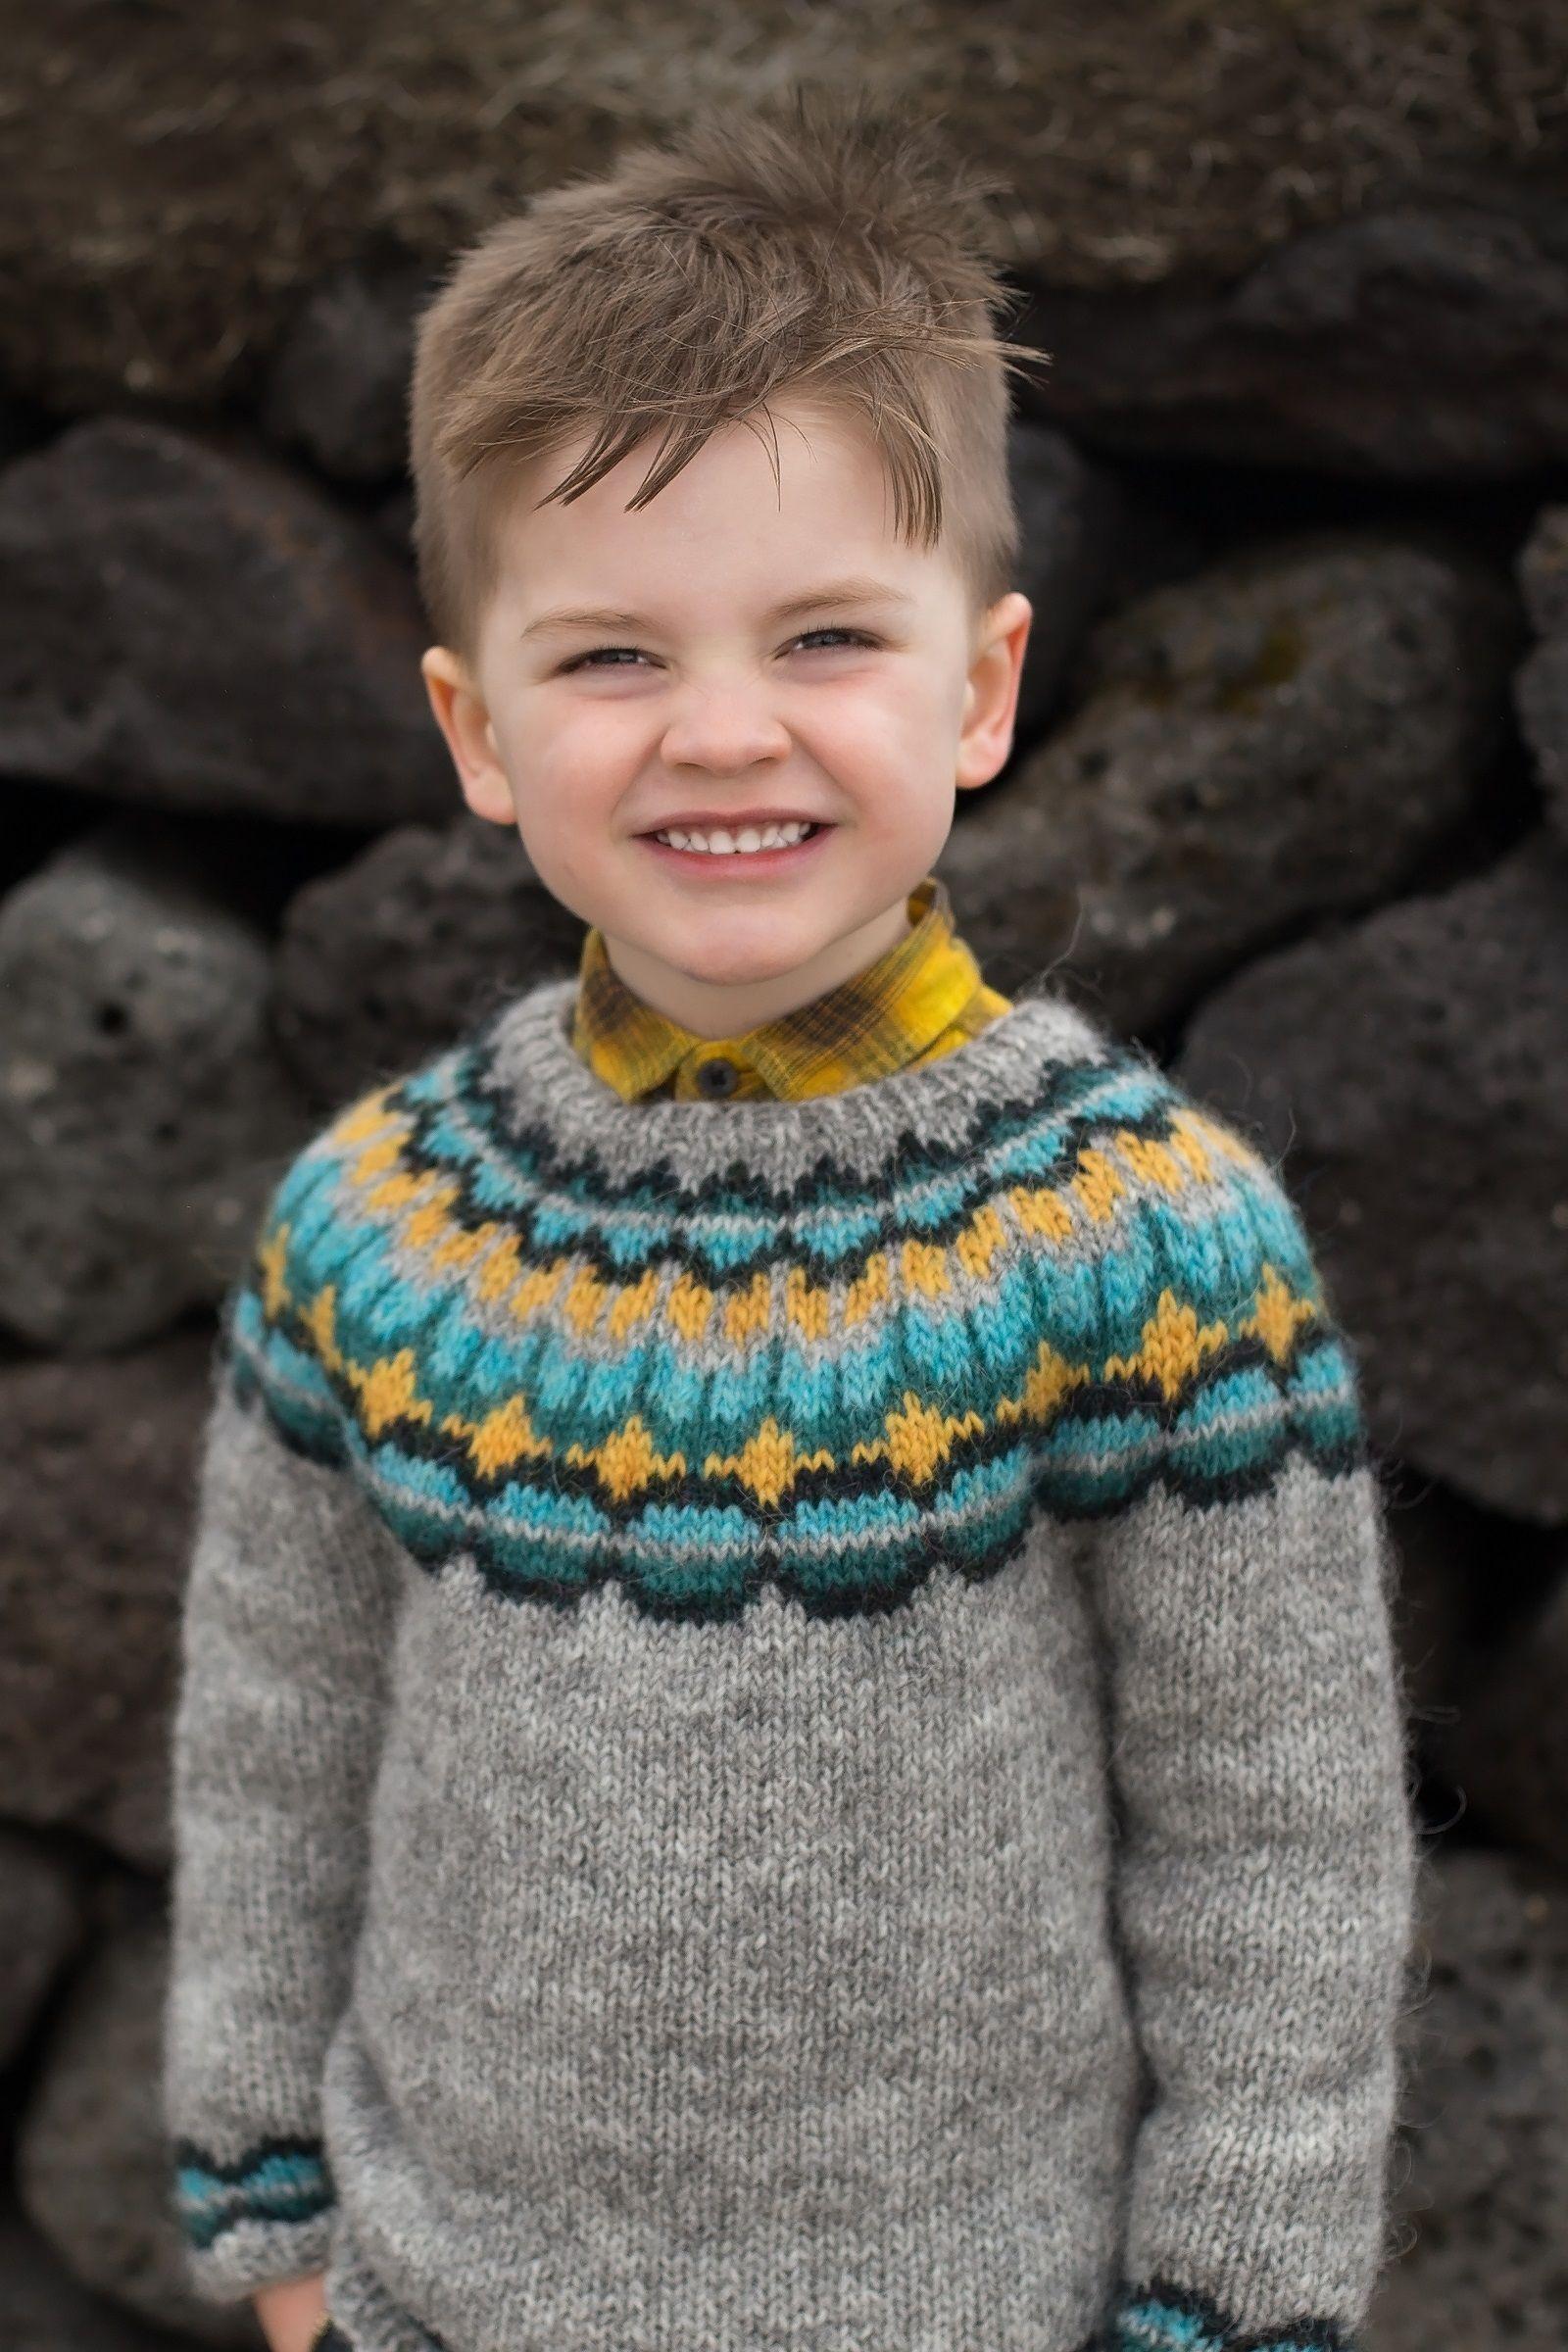 ceb7faf0 boys kids icelandic sweater, photo from tincanknits, lopi knitting pattern,  fuzzy fluffy childs